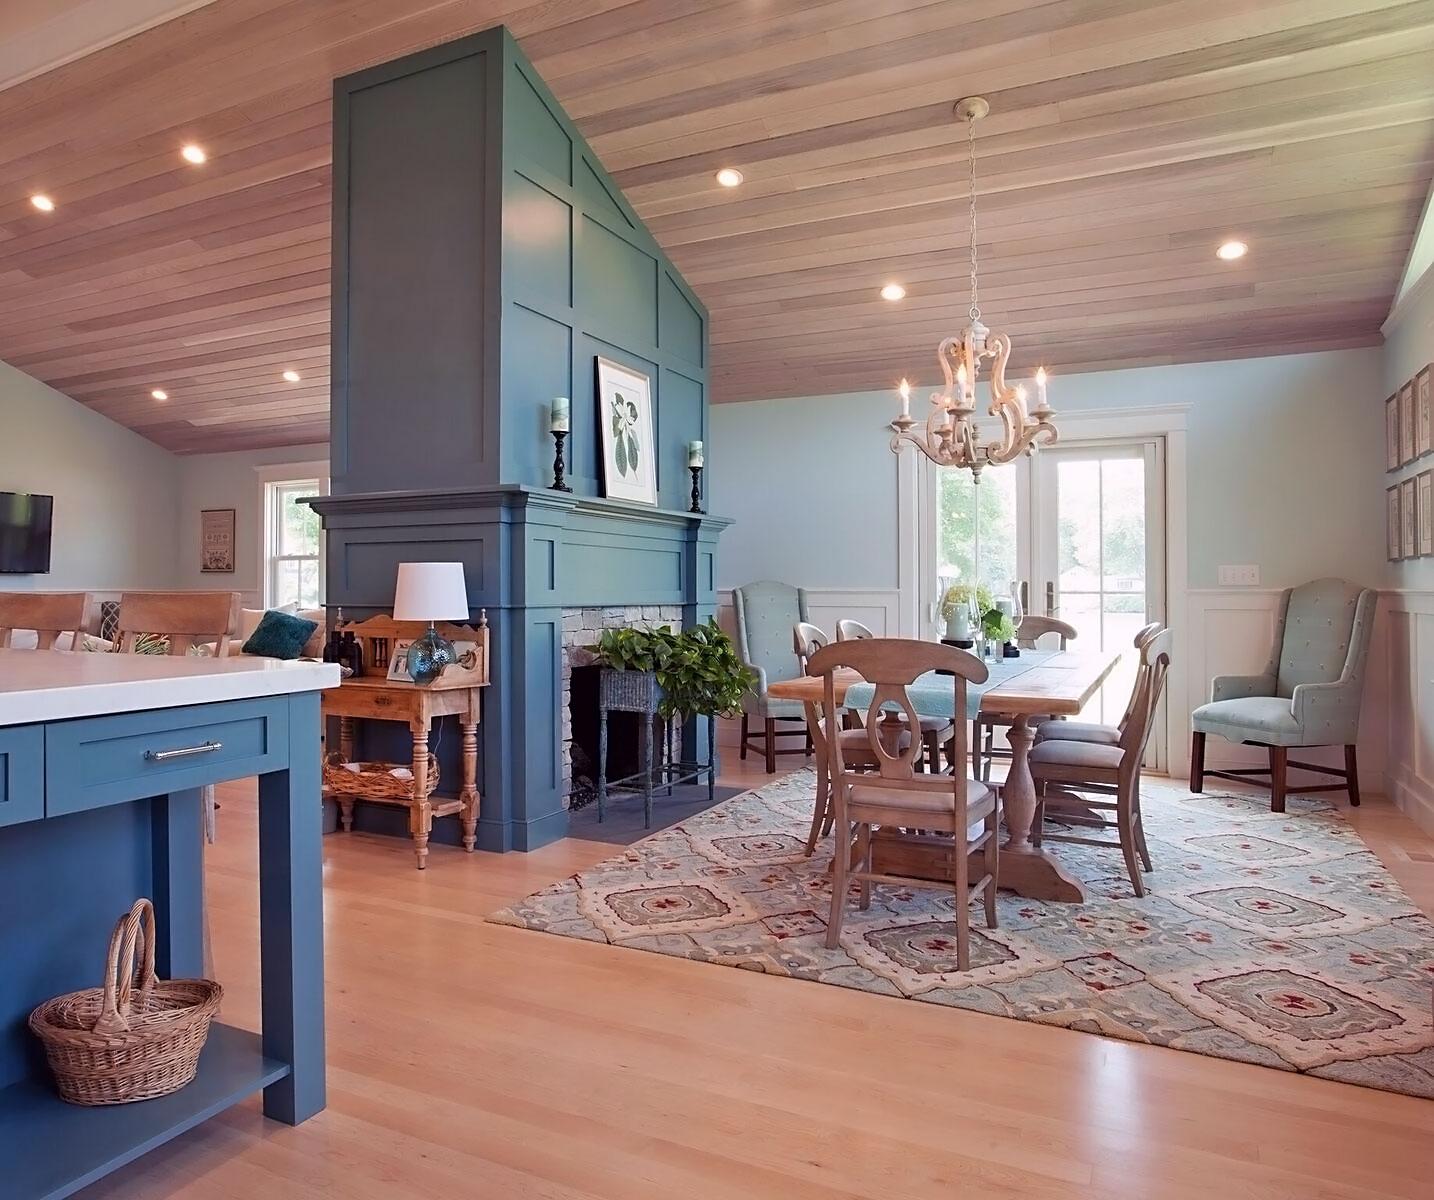 Stephen-Sullivan-Inc-Custom-Home-Builders-Rhode-Island-Narrow-River-Cottage---3